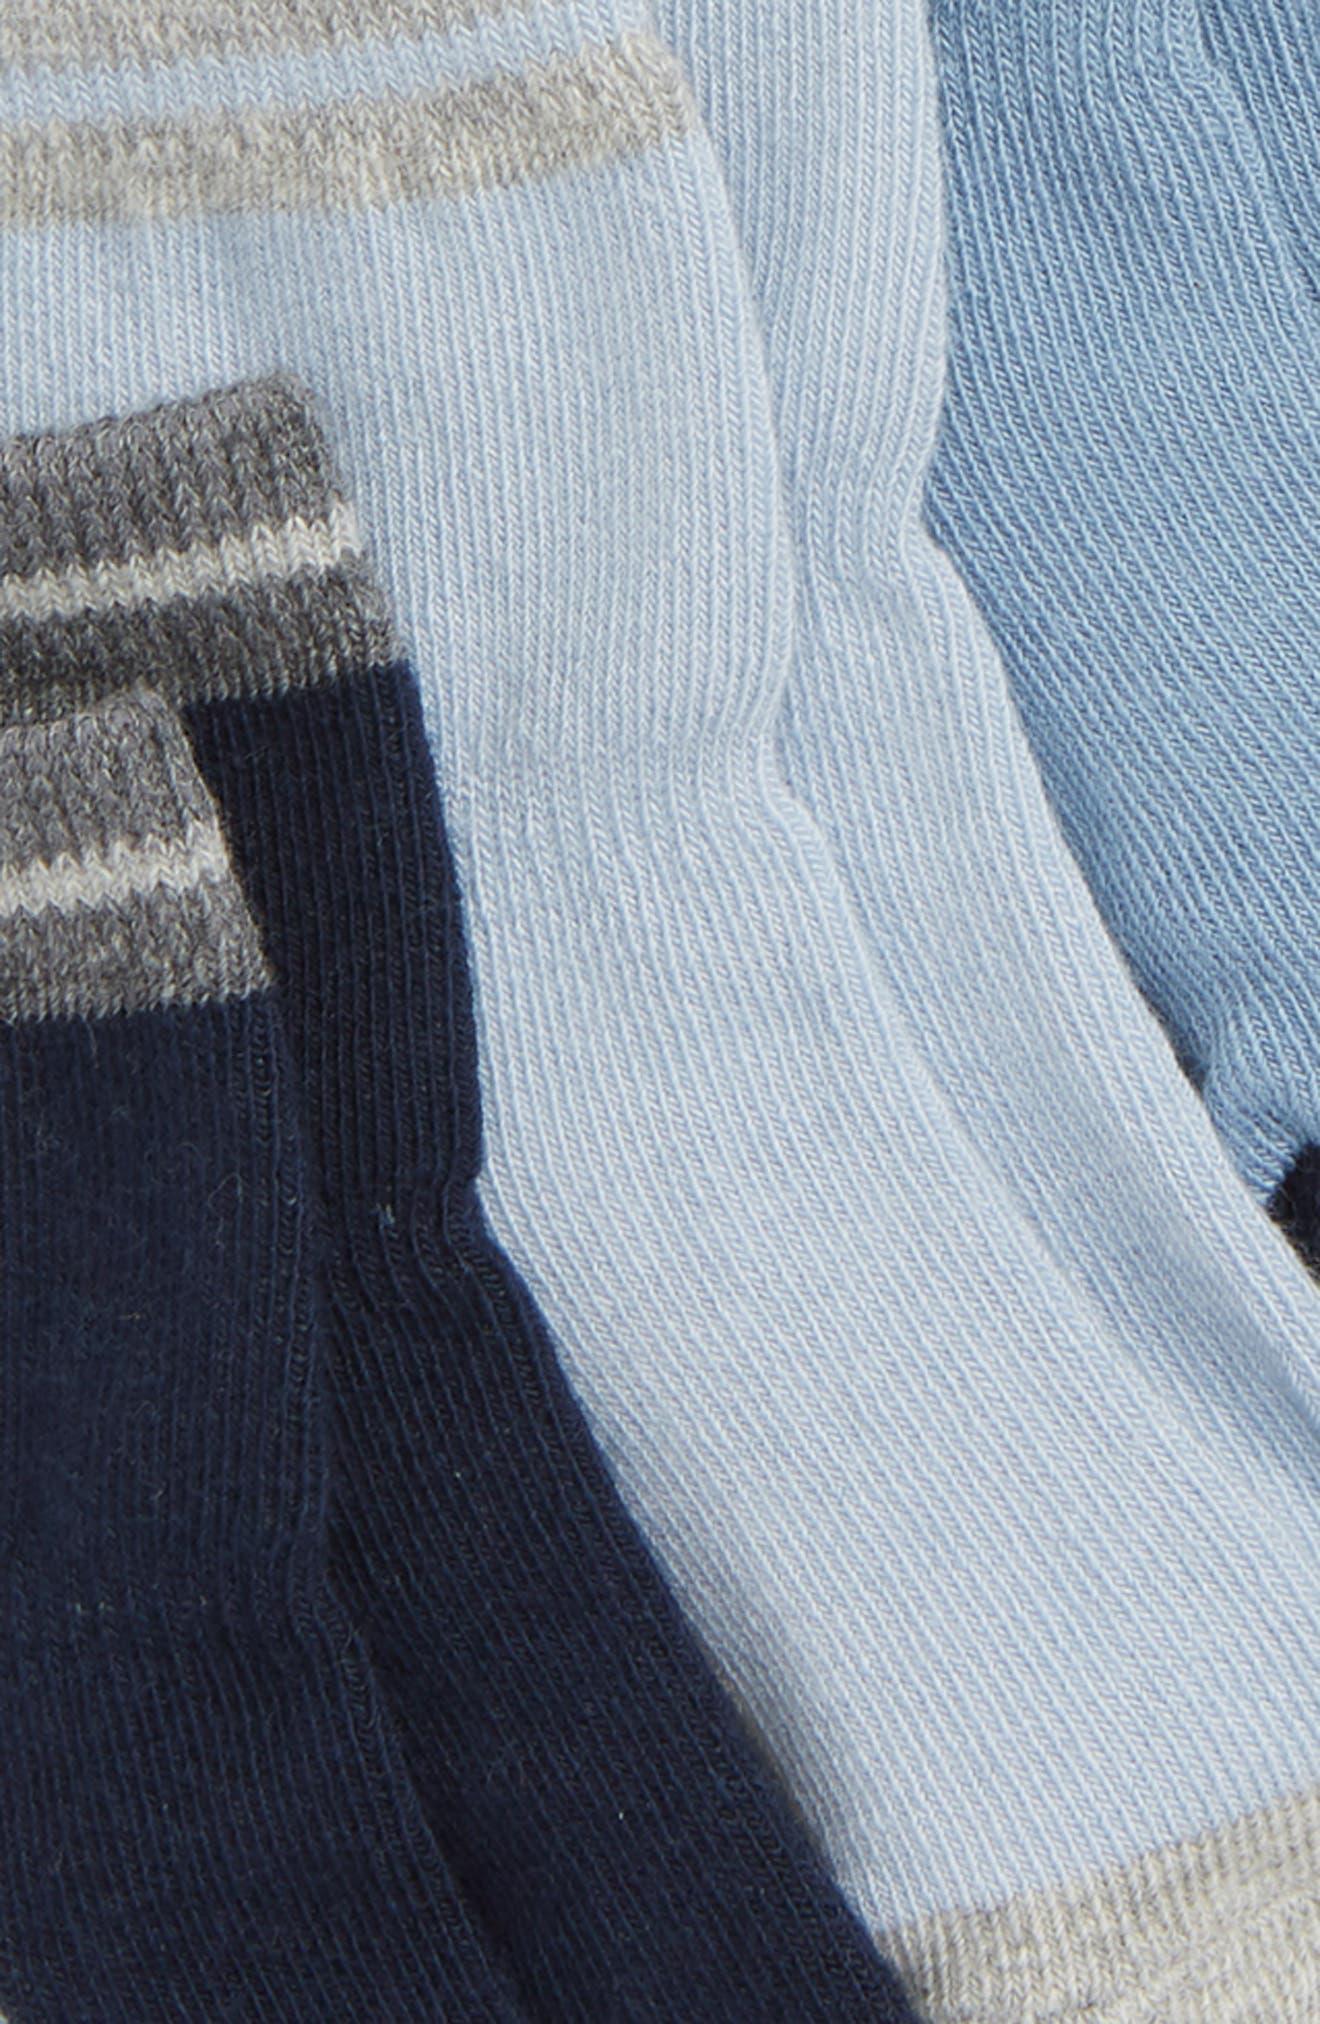 Benjamin Blue 6-Pack Socks,                             Alternate thumbnail 2, color,                             420